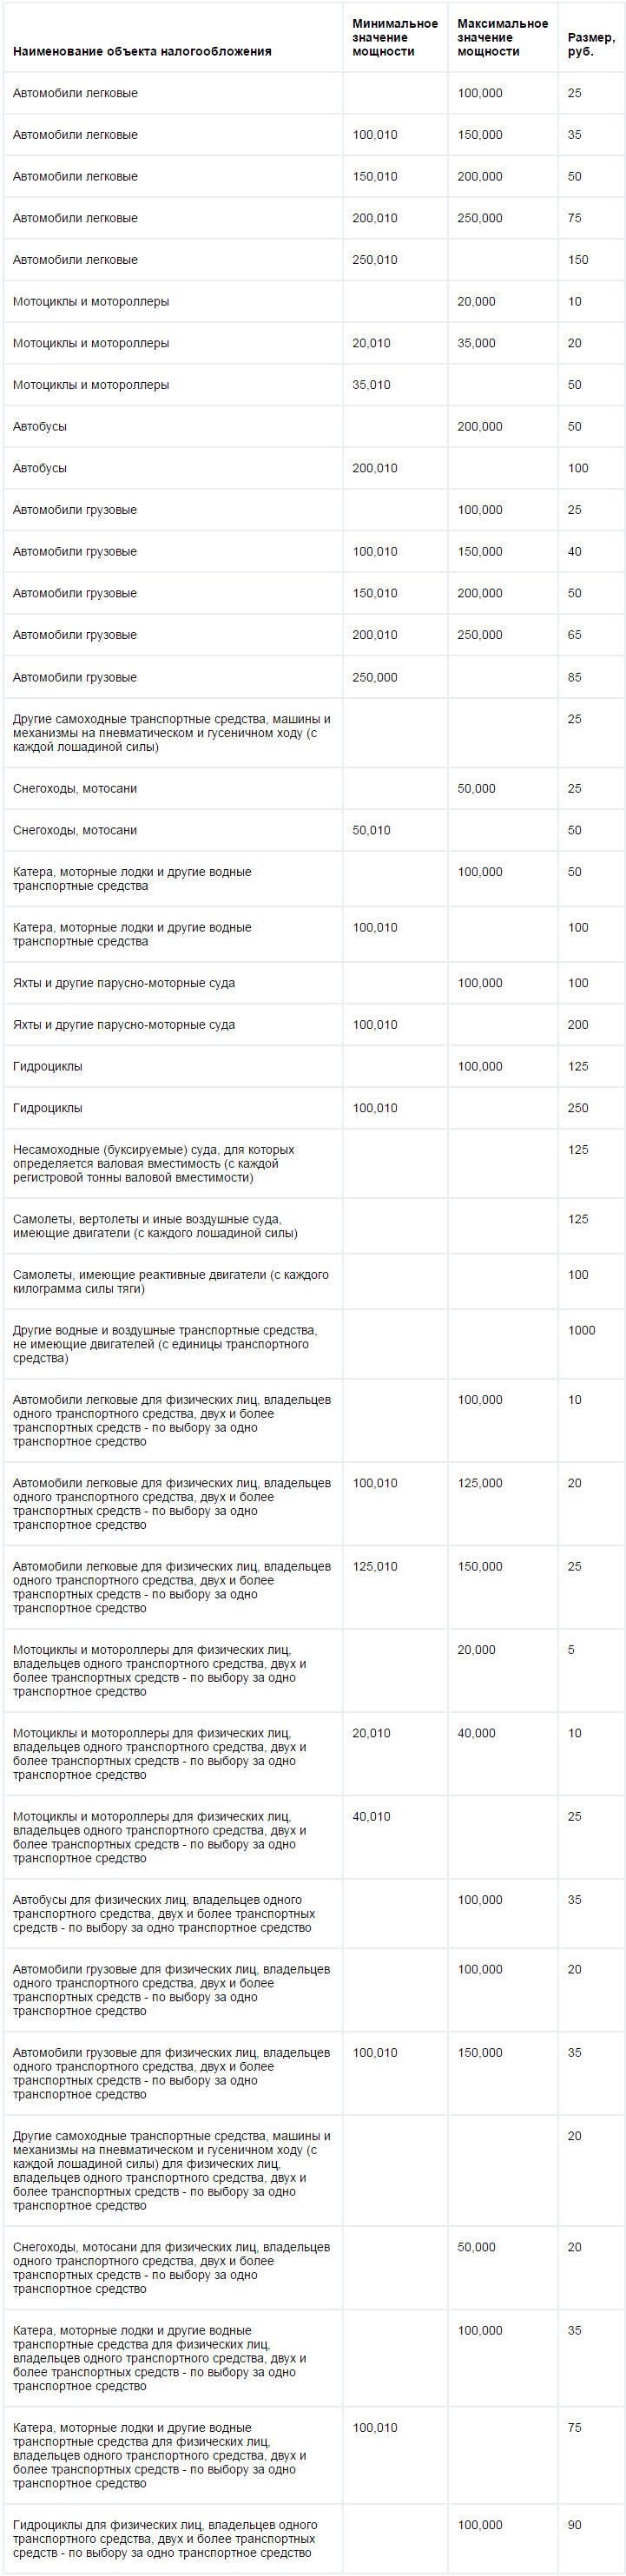 Ставки транспортного налога республики Башкортостан